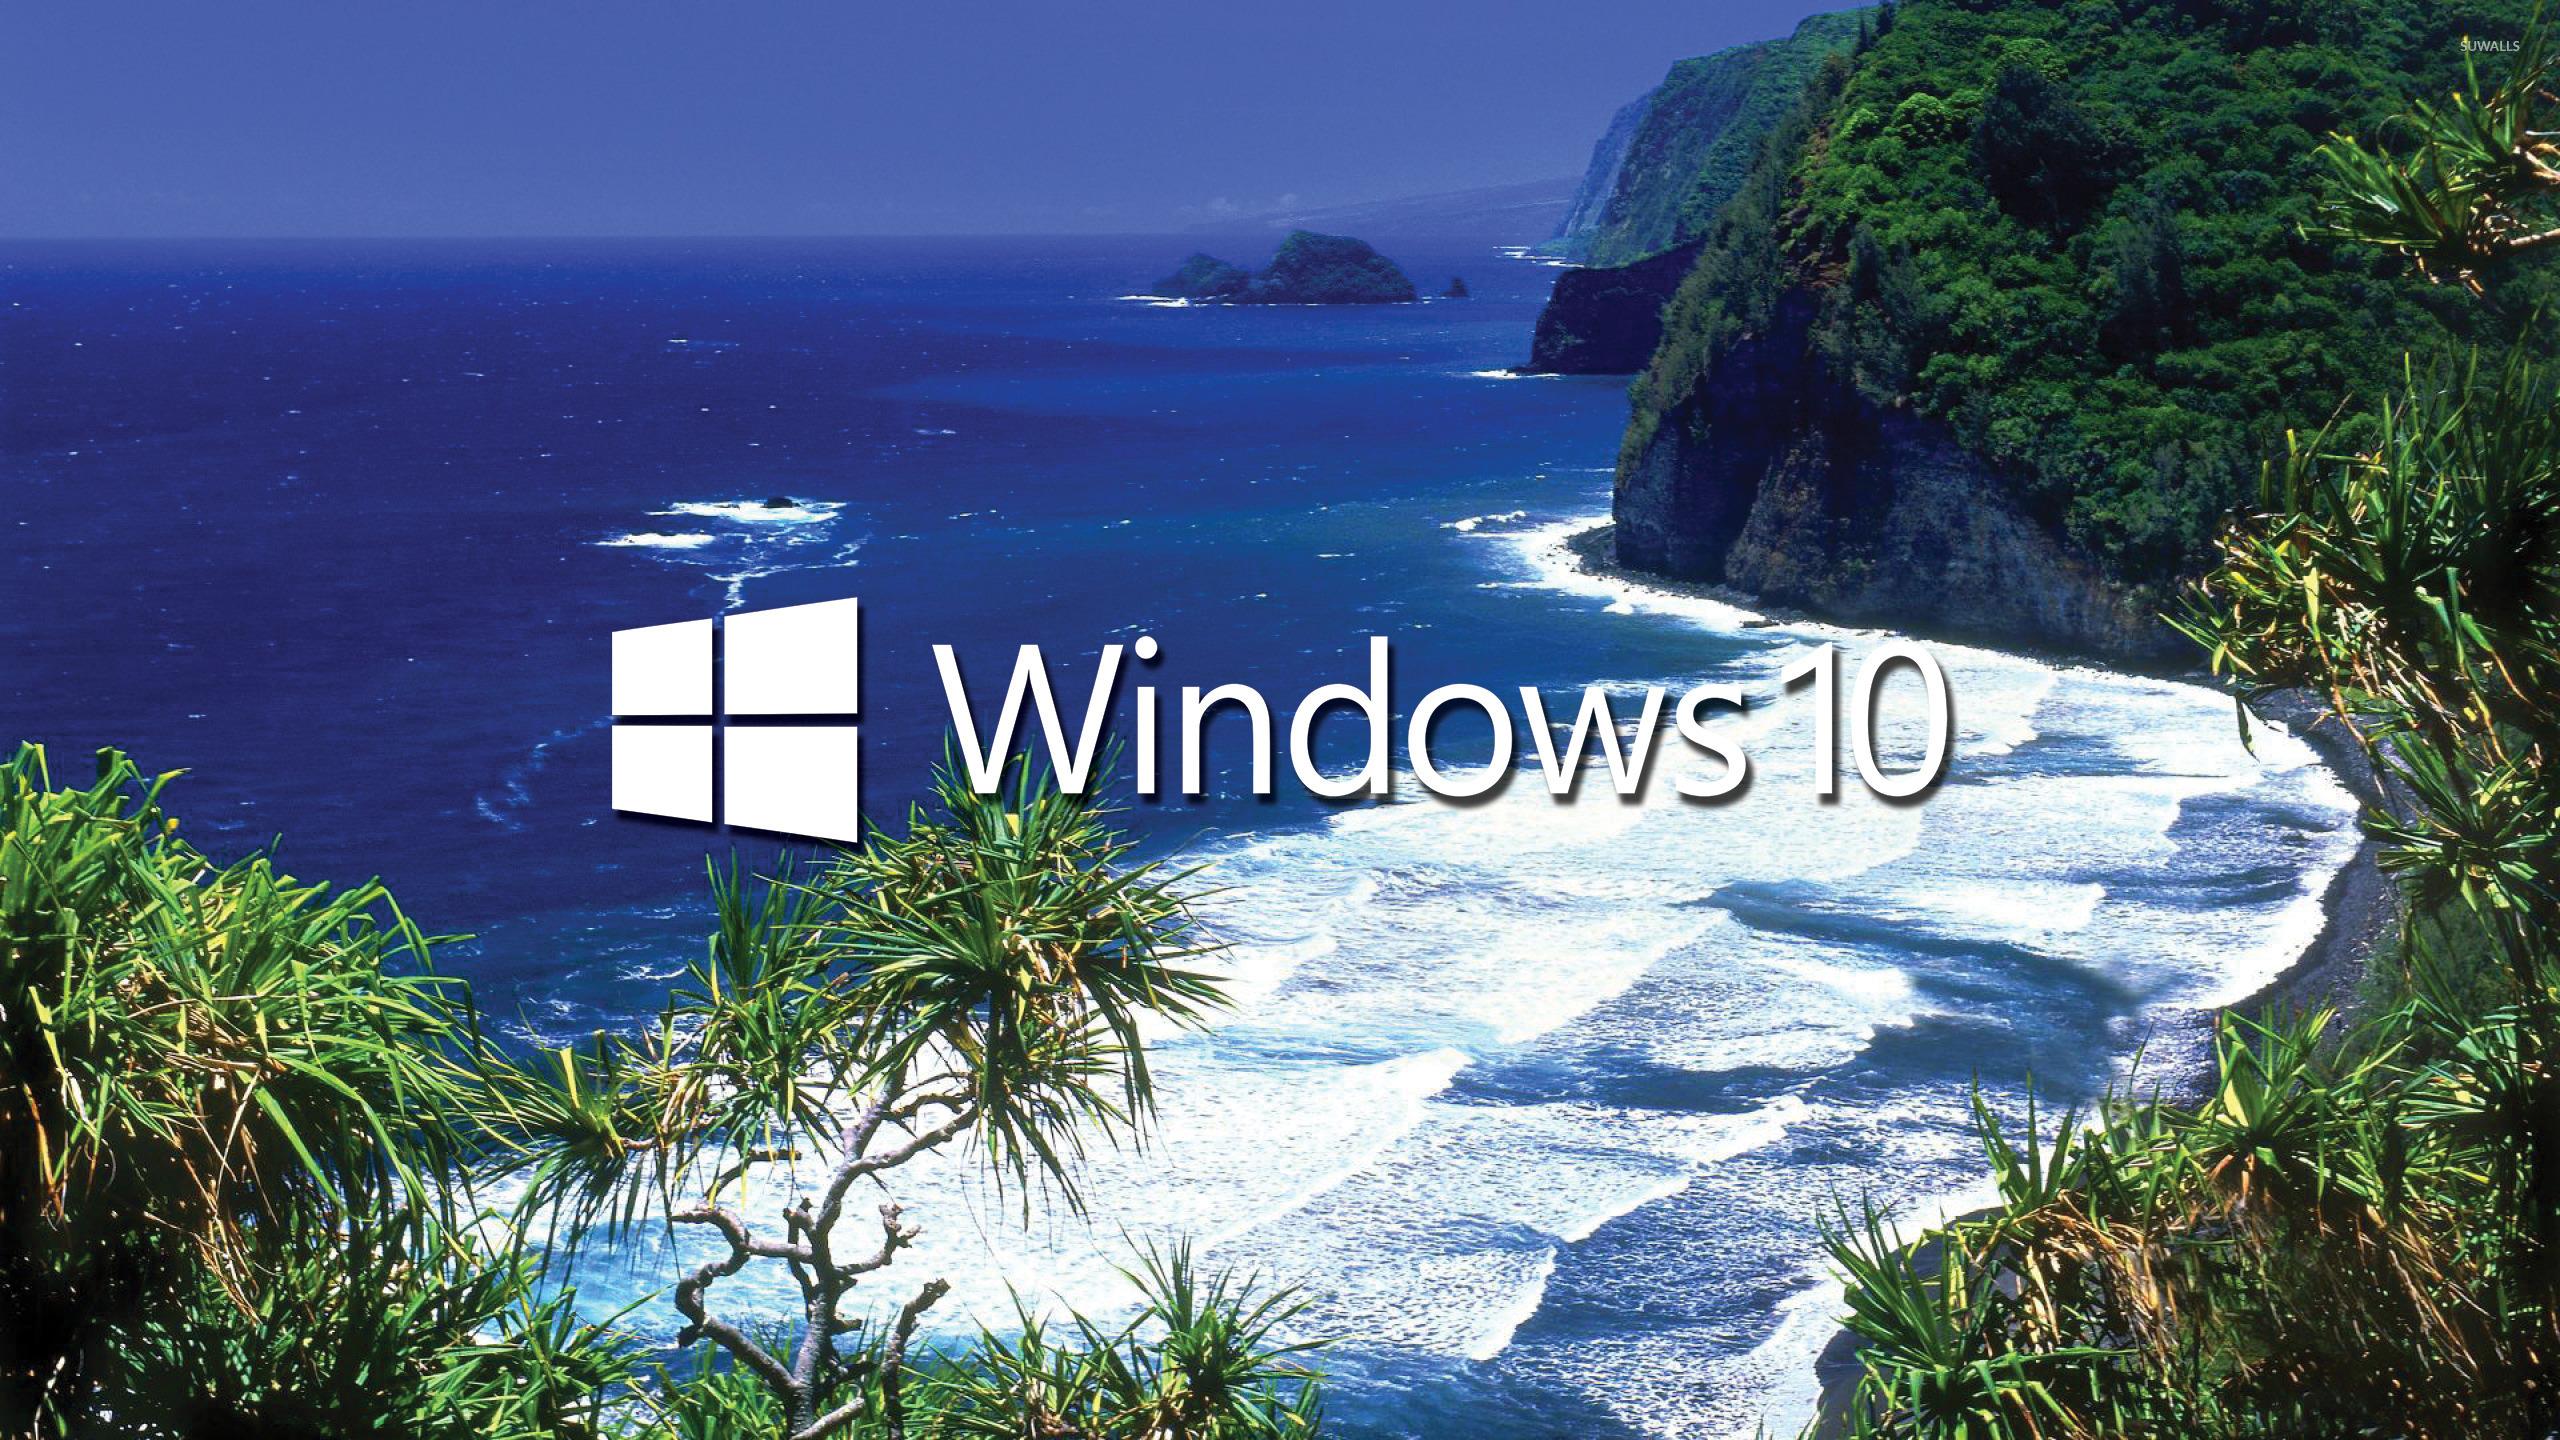 Windows 10 white text logo on the tropical shore wallpaper 2560x1440 2560x1440